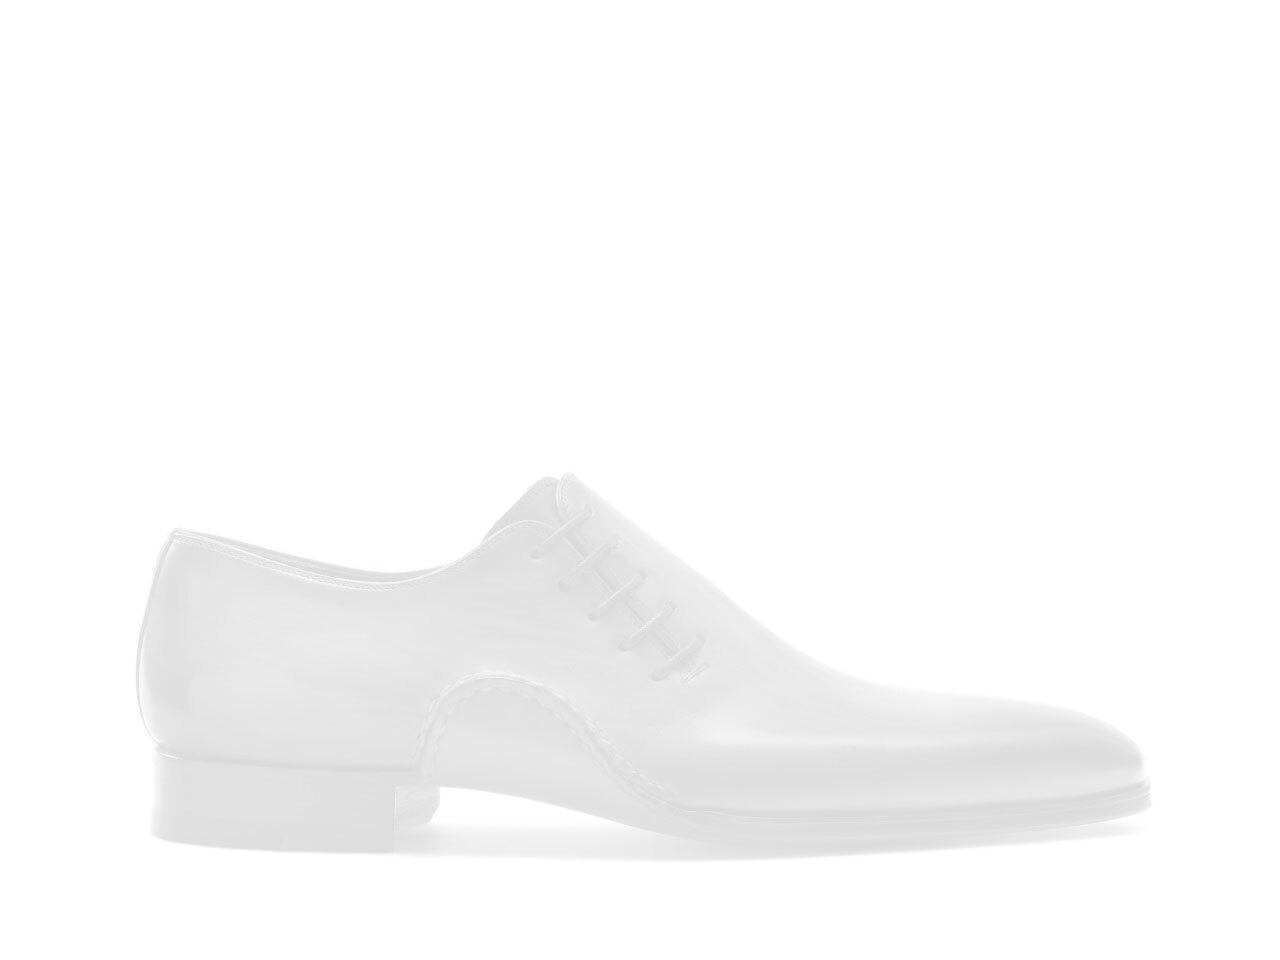 Sole of the Magnanni Leiva Cognac Men's Sneakers